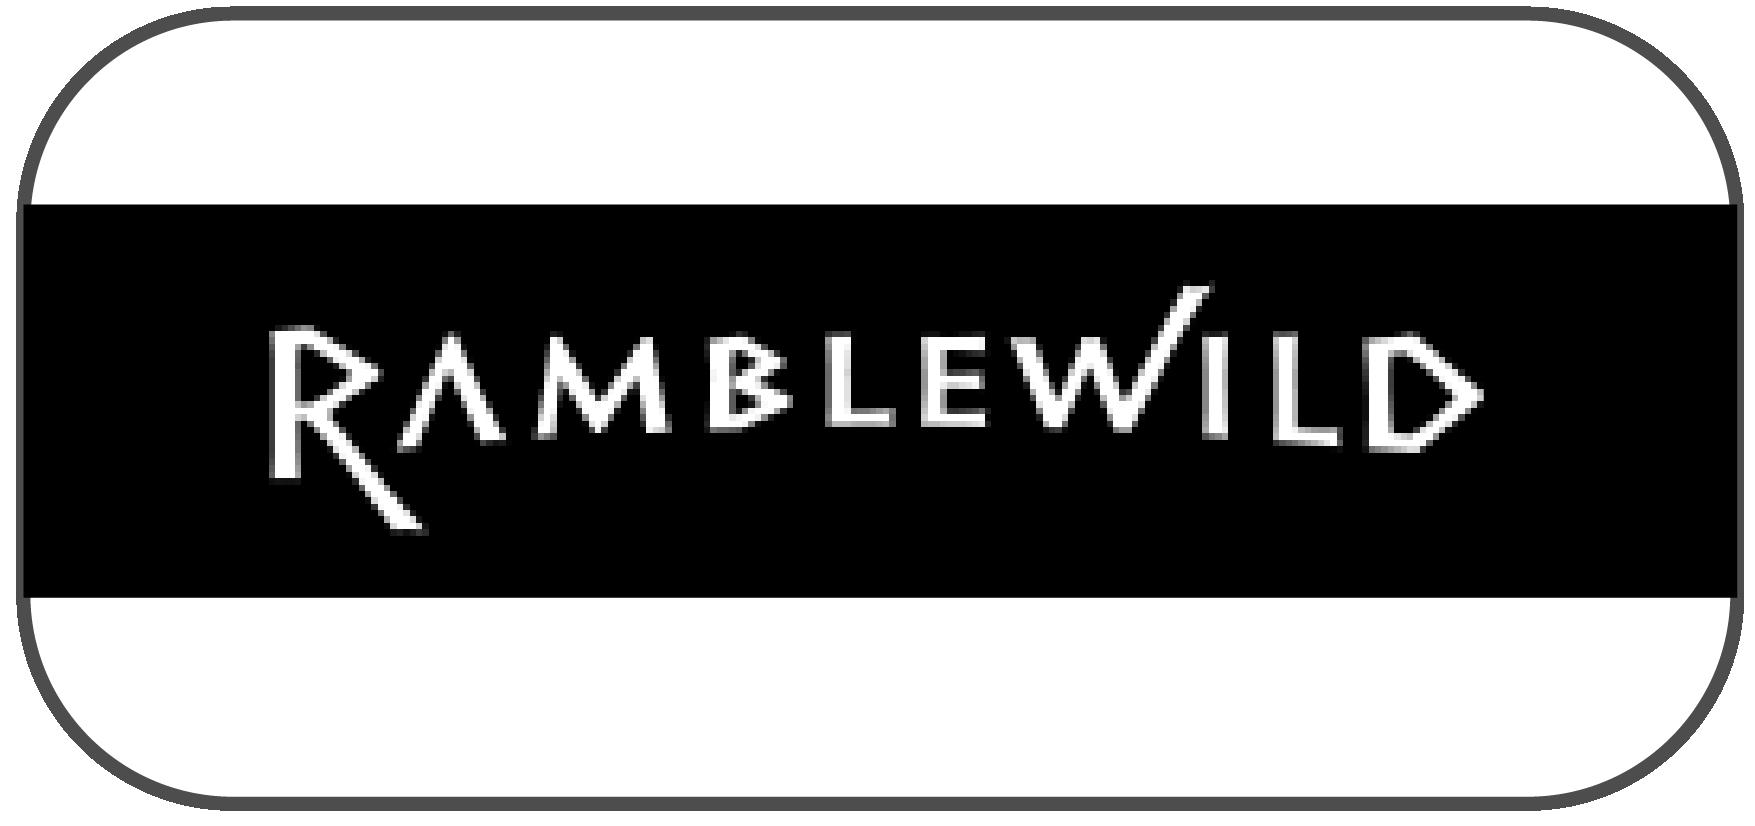 RAMBLEWILD Aerial Adventure Park